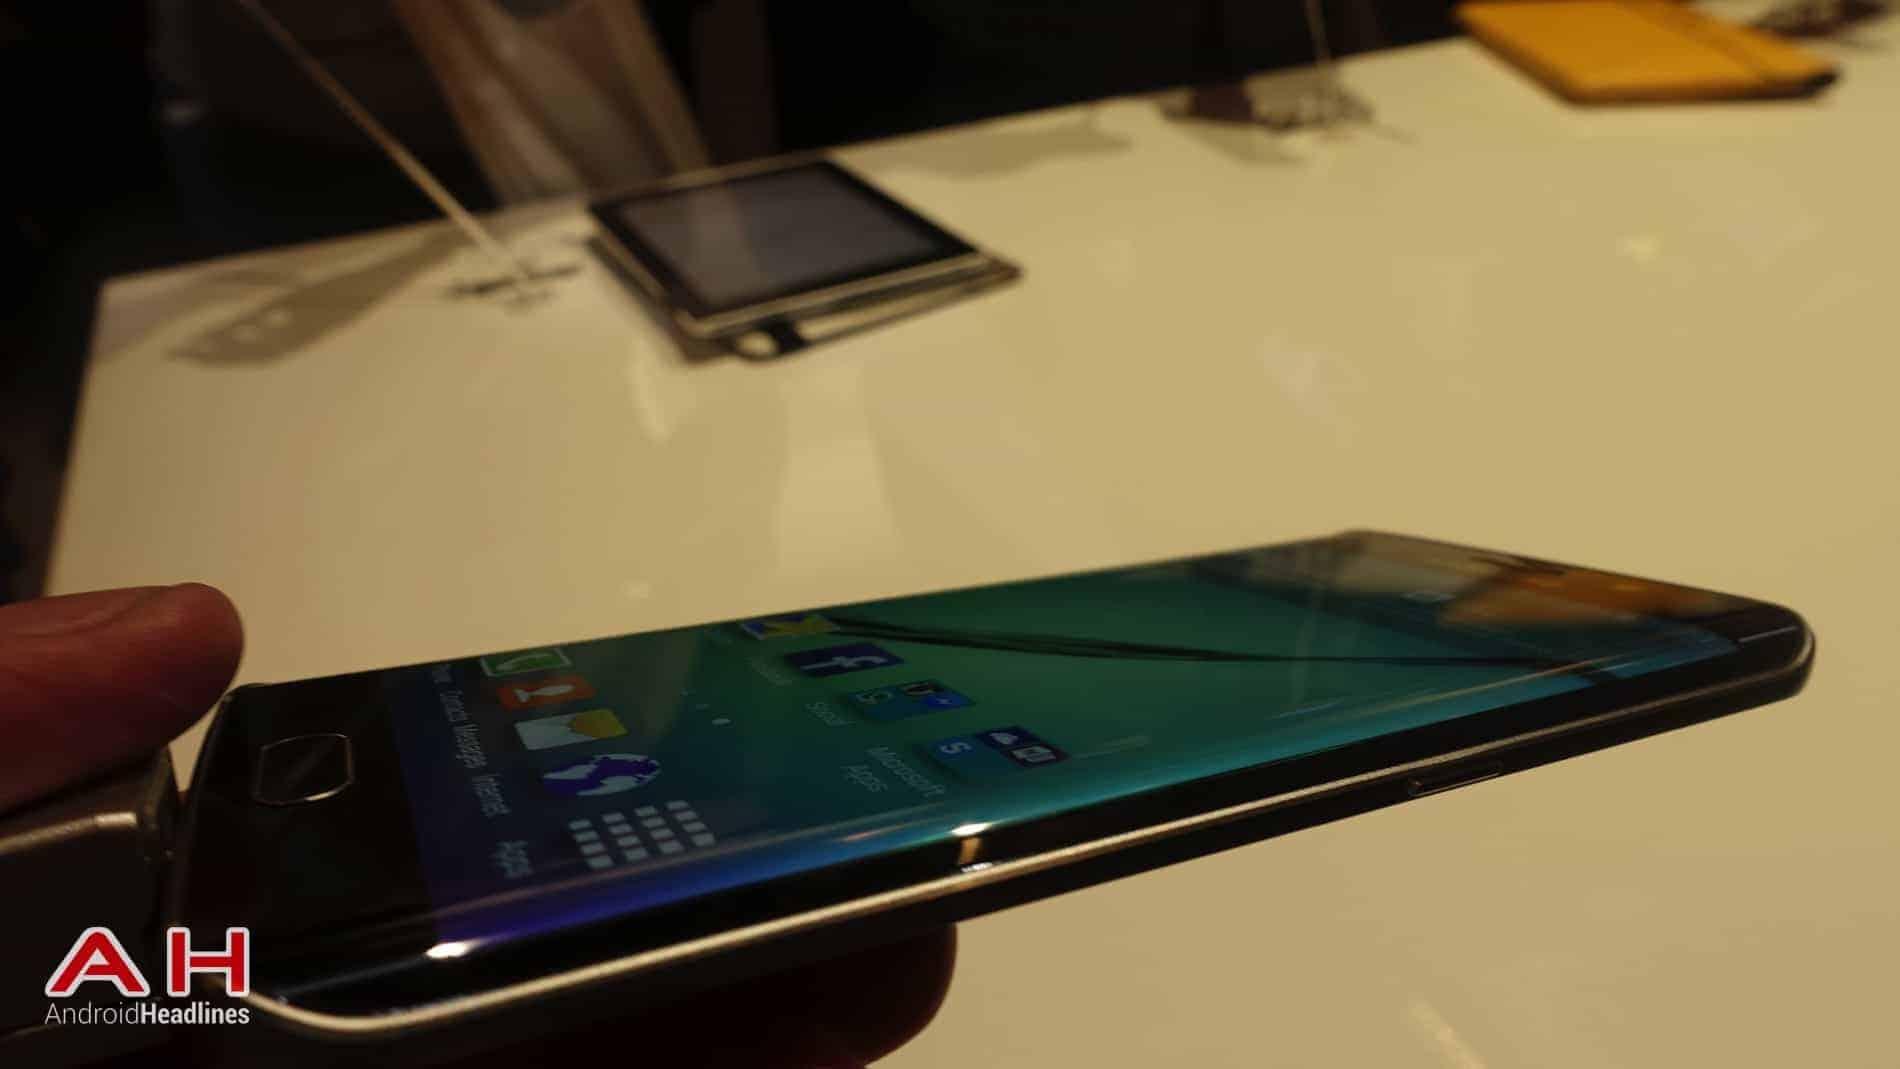 Galaxy S6 S6 Edge Hands On AH 18